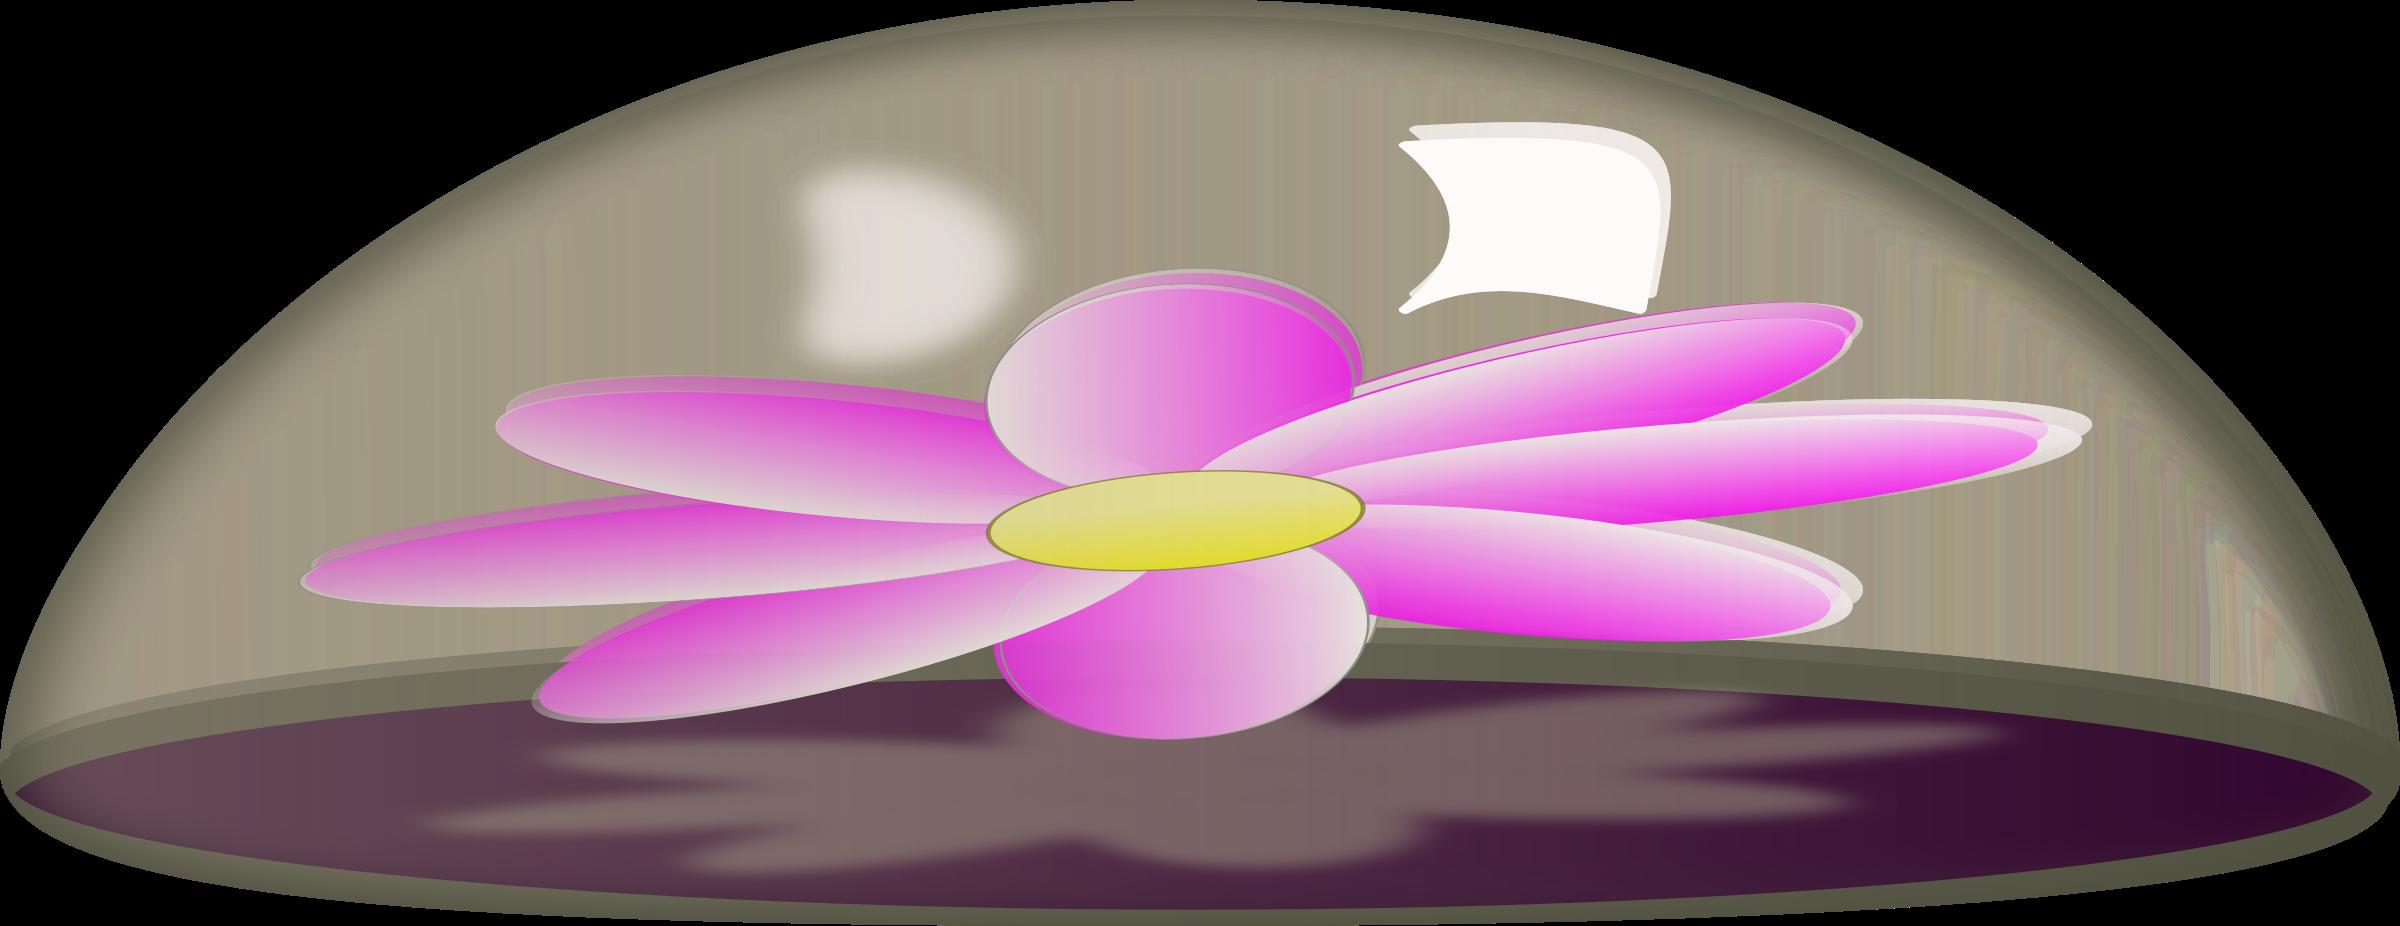 Weight clipart clip art. Flower in glass paper